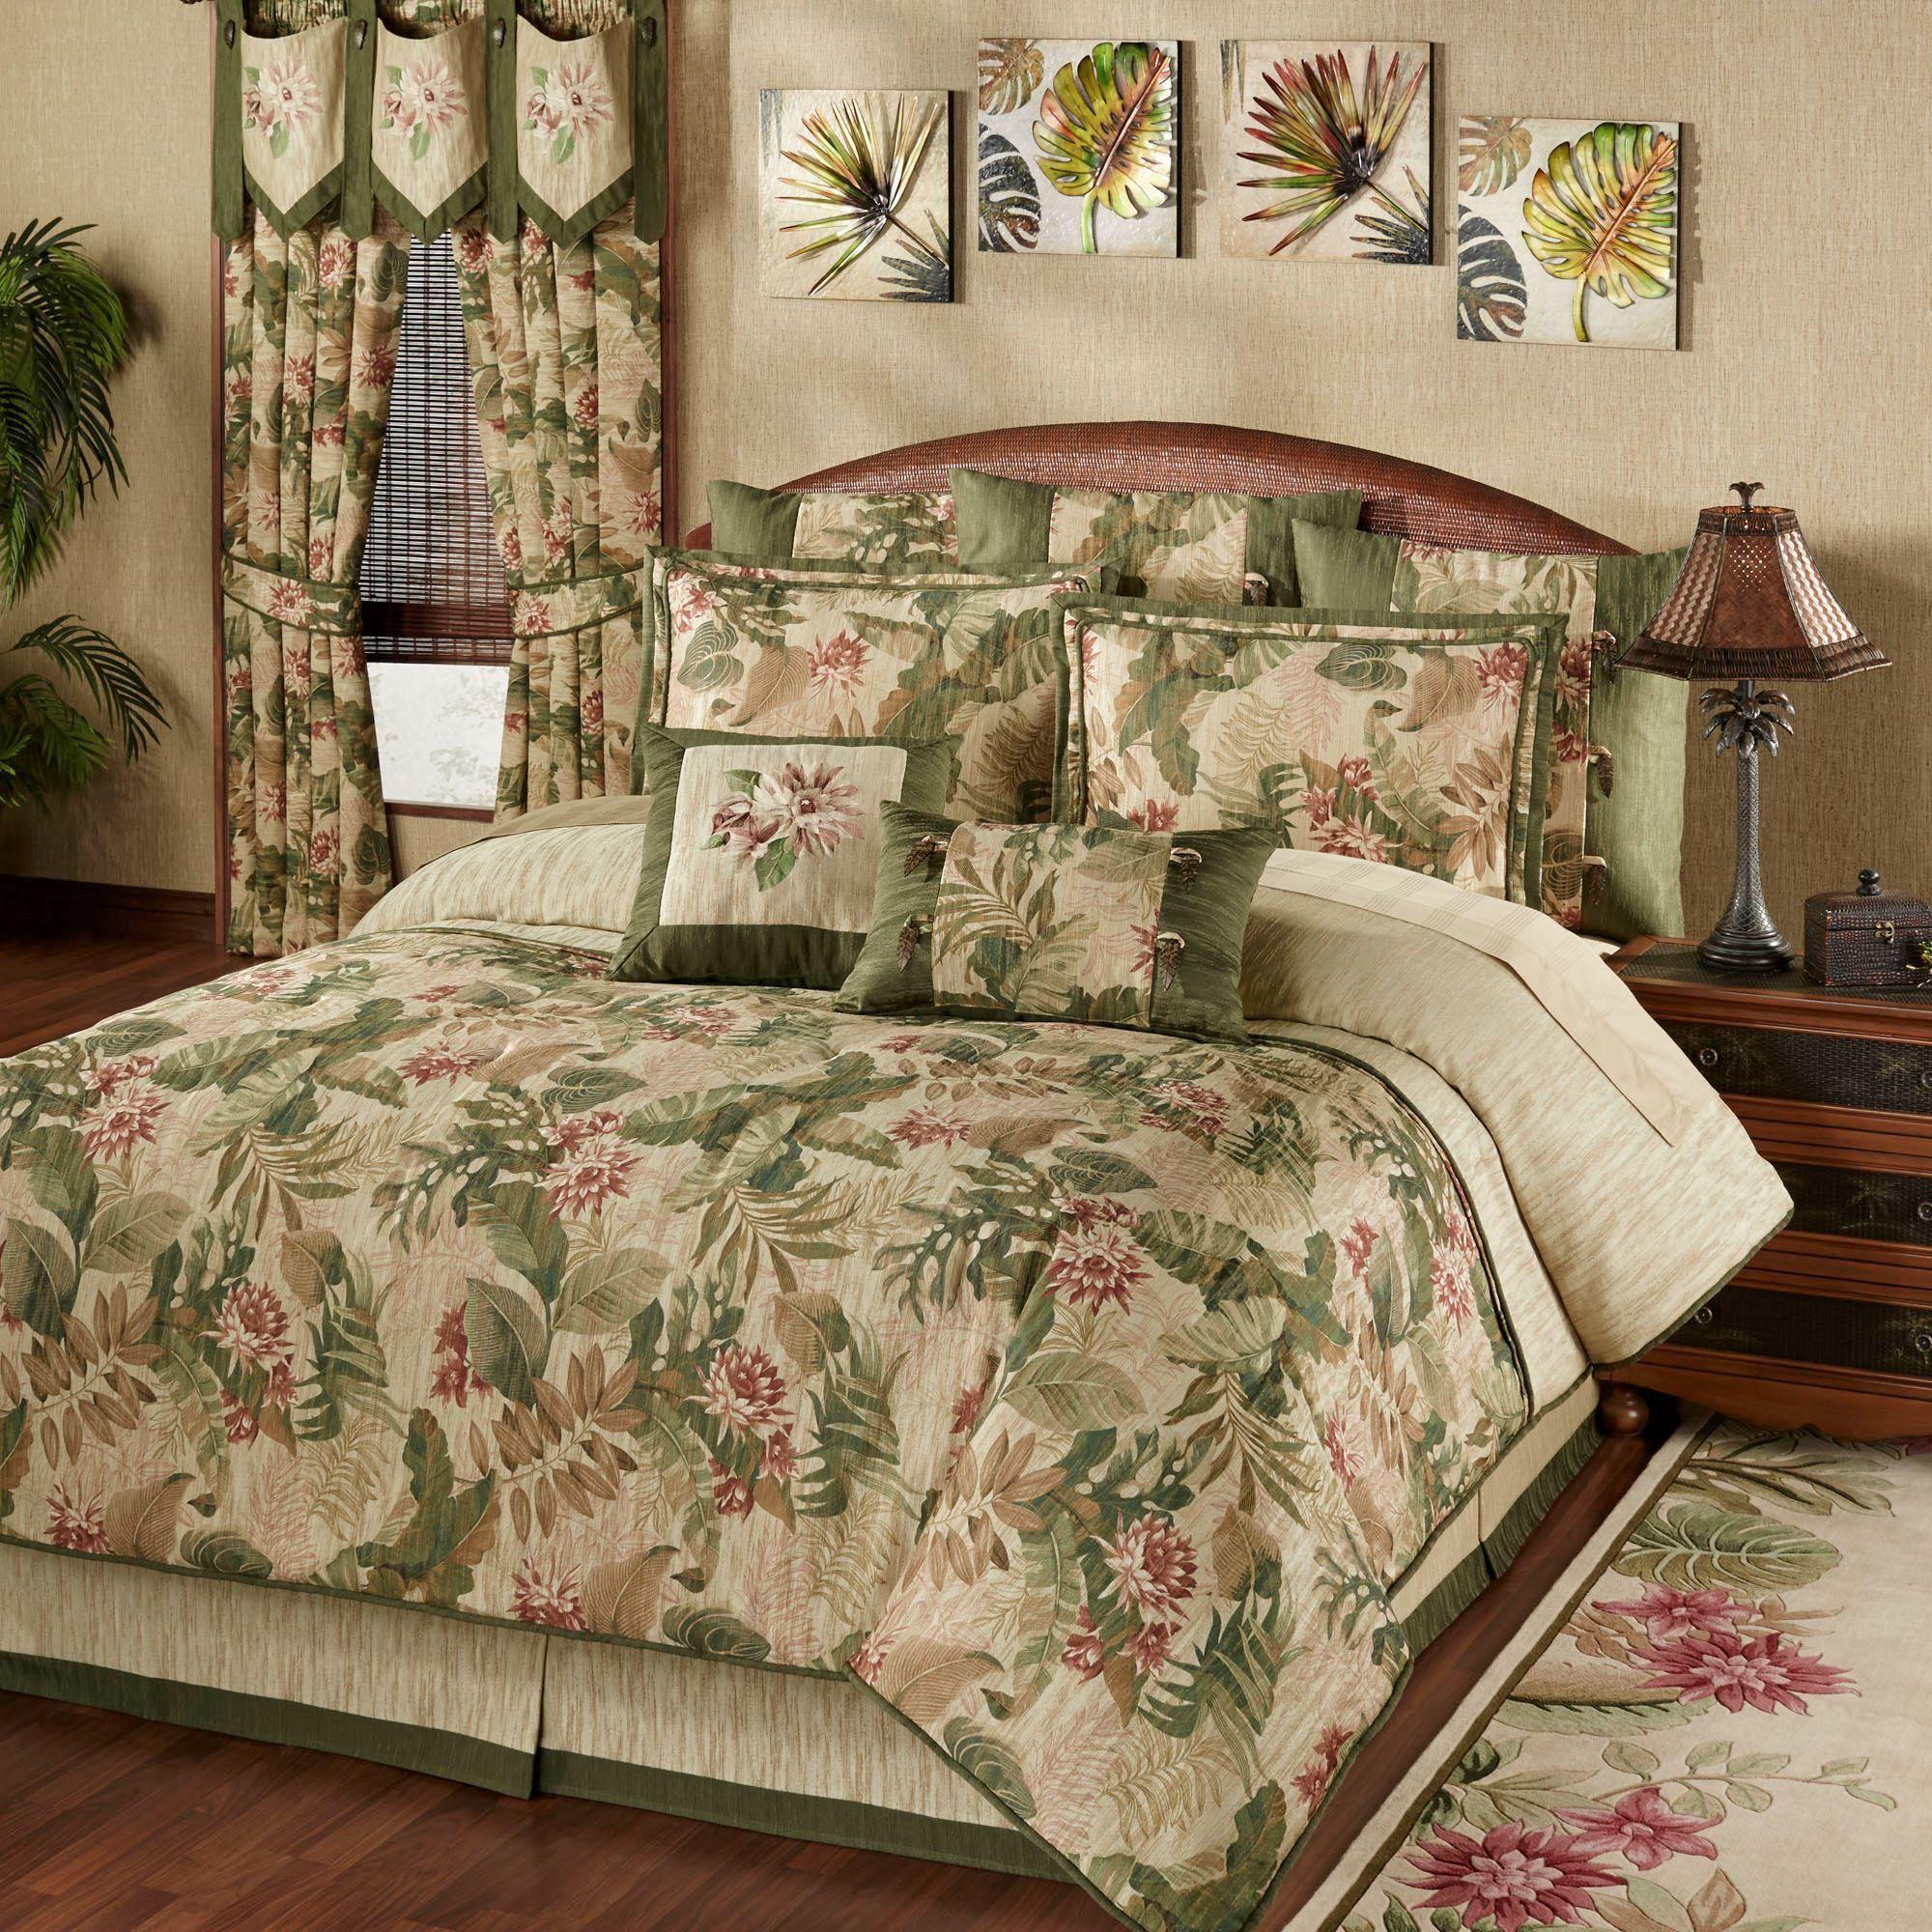 Tropical Haven Comforter Bedding Tropical bedrooms, Bed